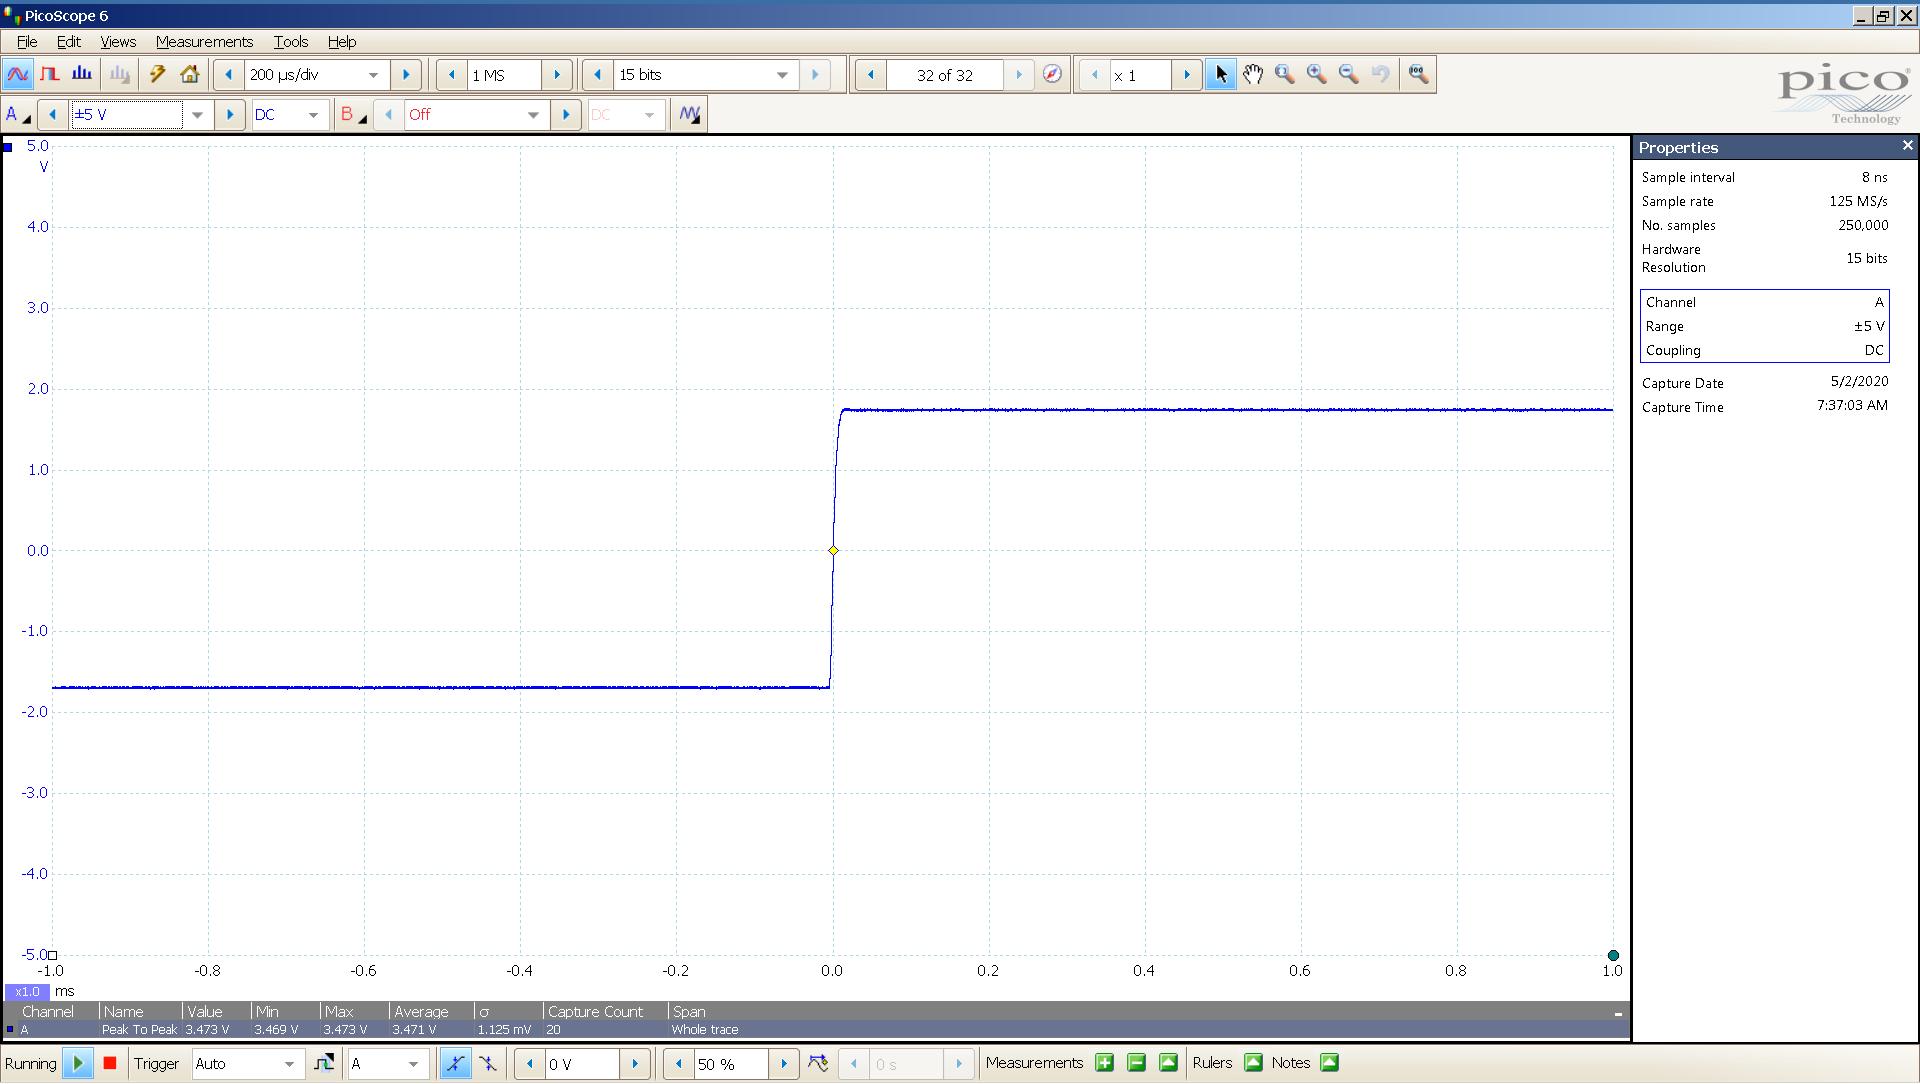 20200502-05 KTE Spring2 20 Hz sqr -4 dBFS 4 Vpp 200uS div SE - ASIO - NOS.png